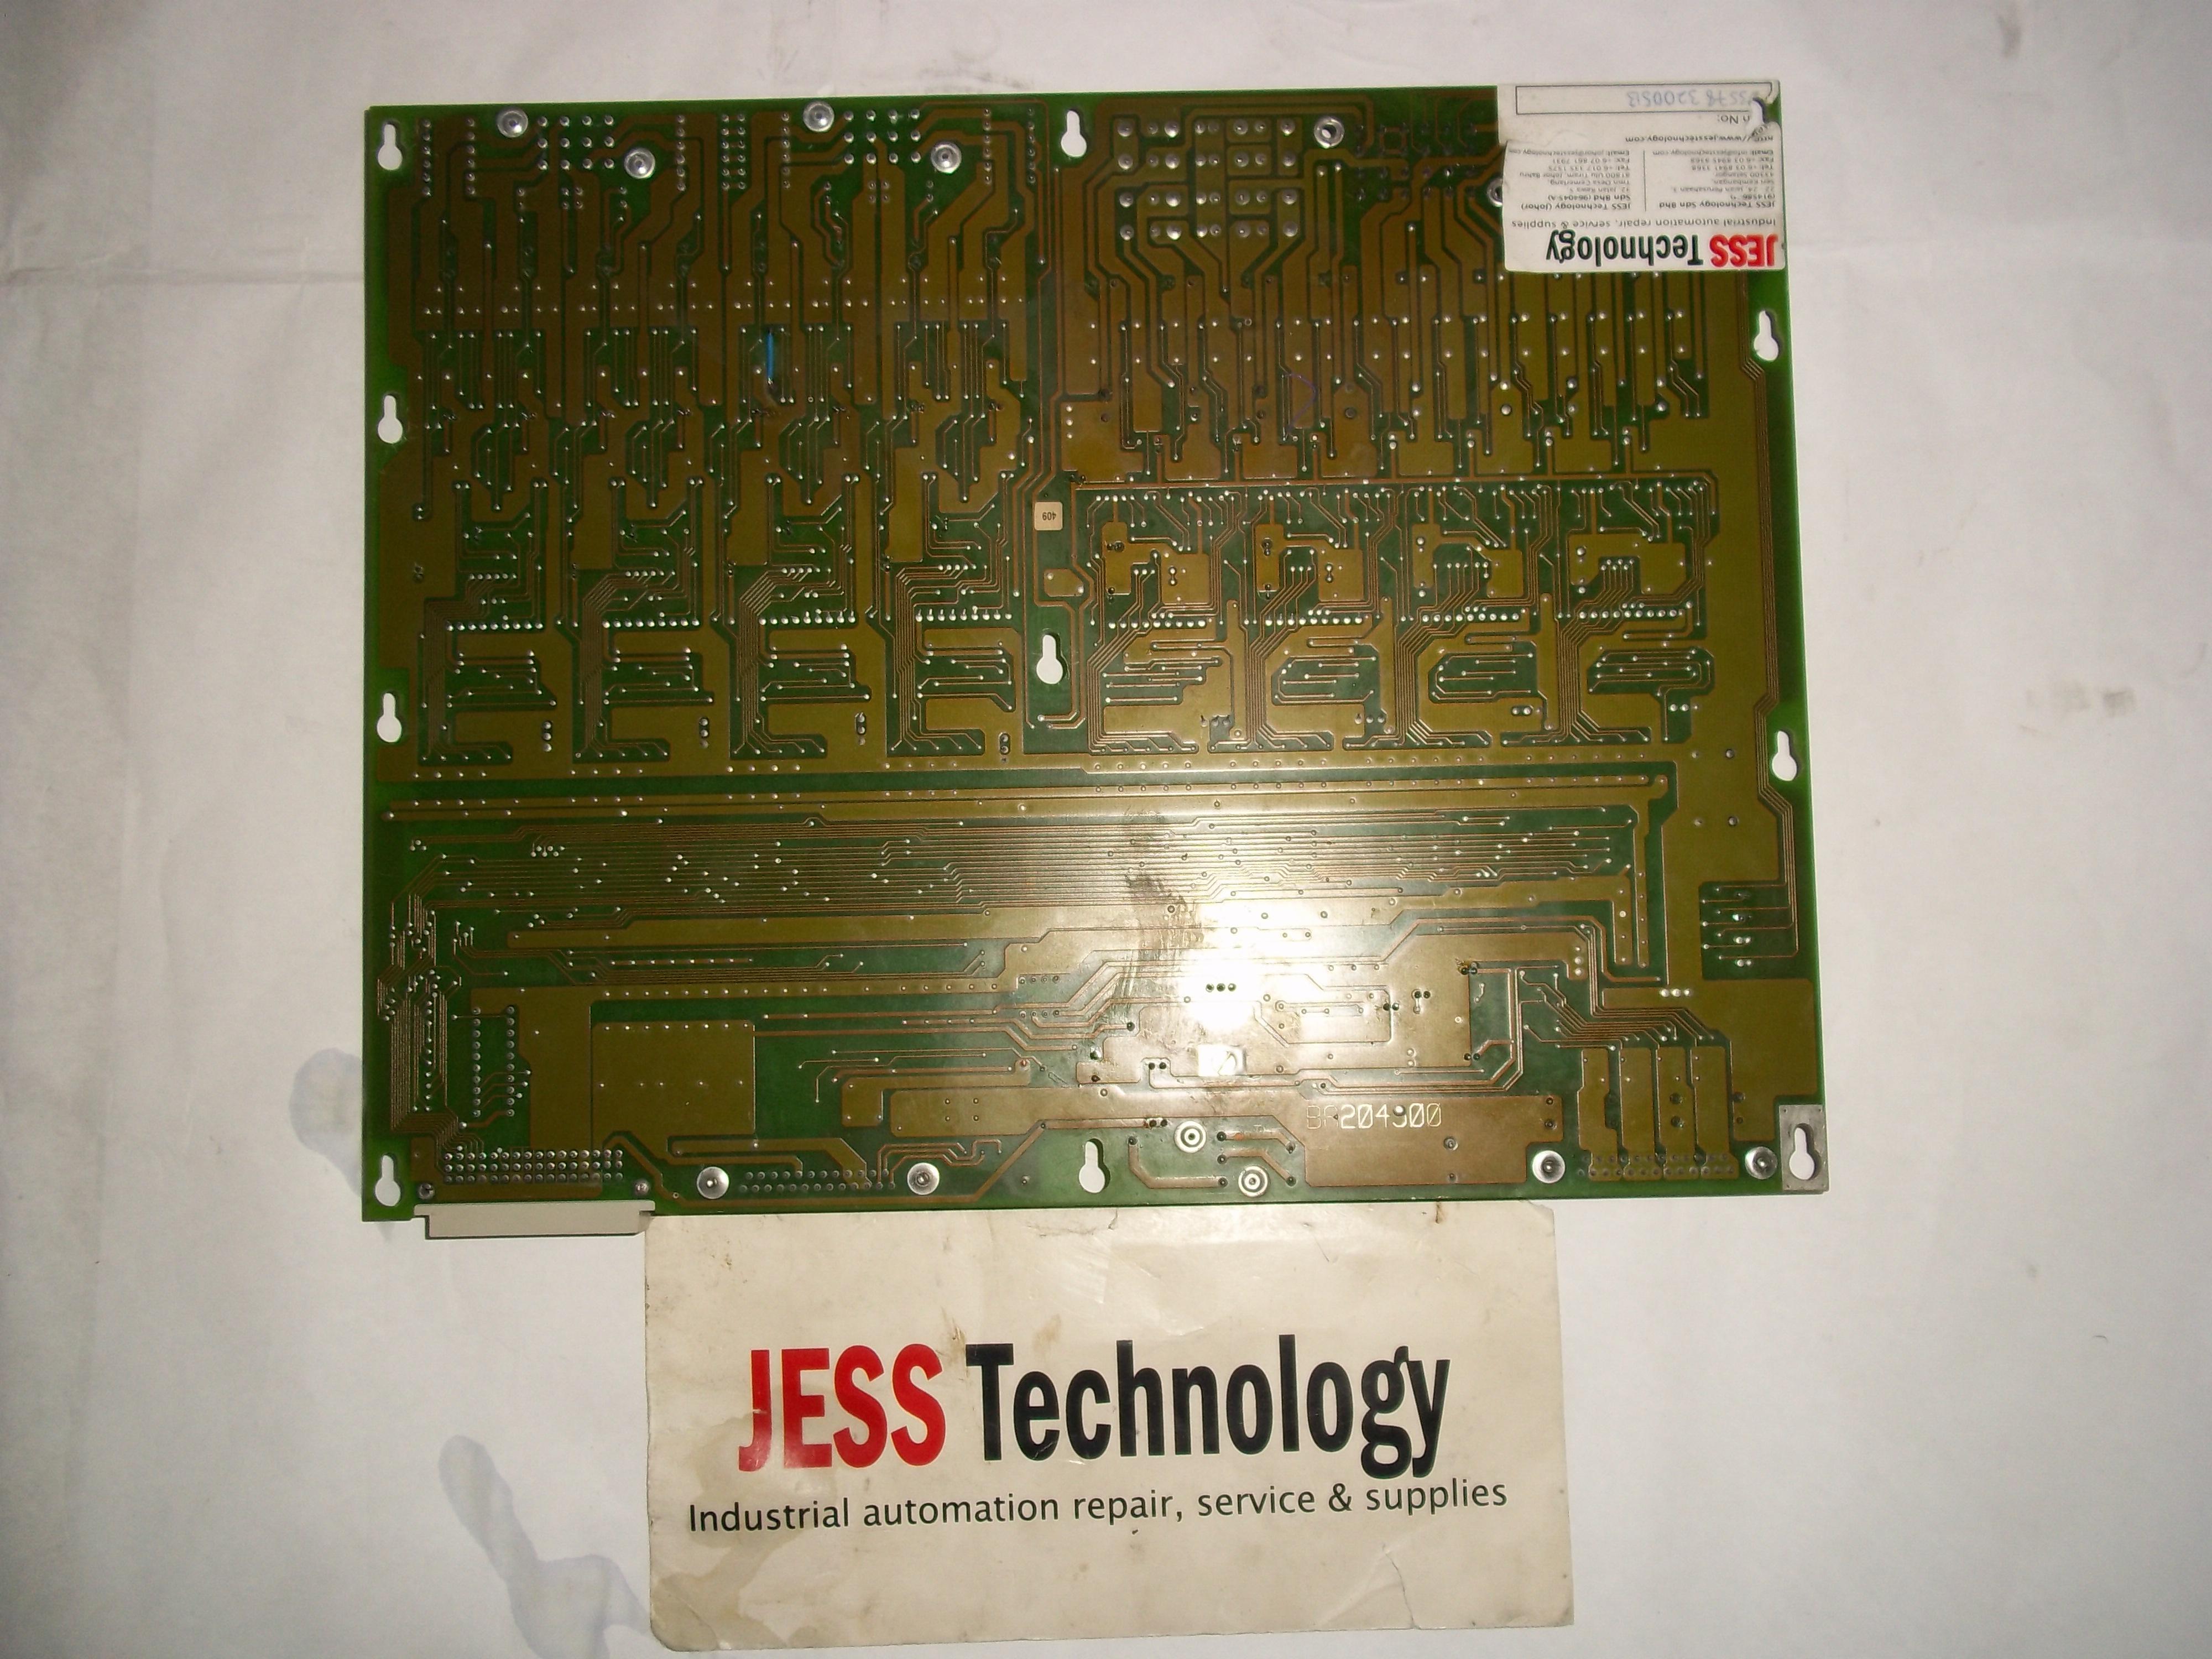 Repair BE212360 EVCO  IB2E-2 PCB BOARD (BE212360) (A3239) in Malaysia, Singapore, Thailand, Indonesia